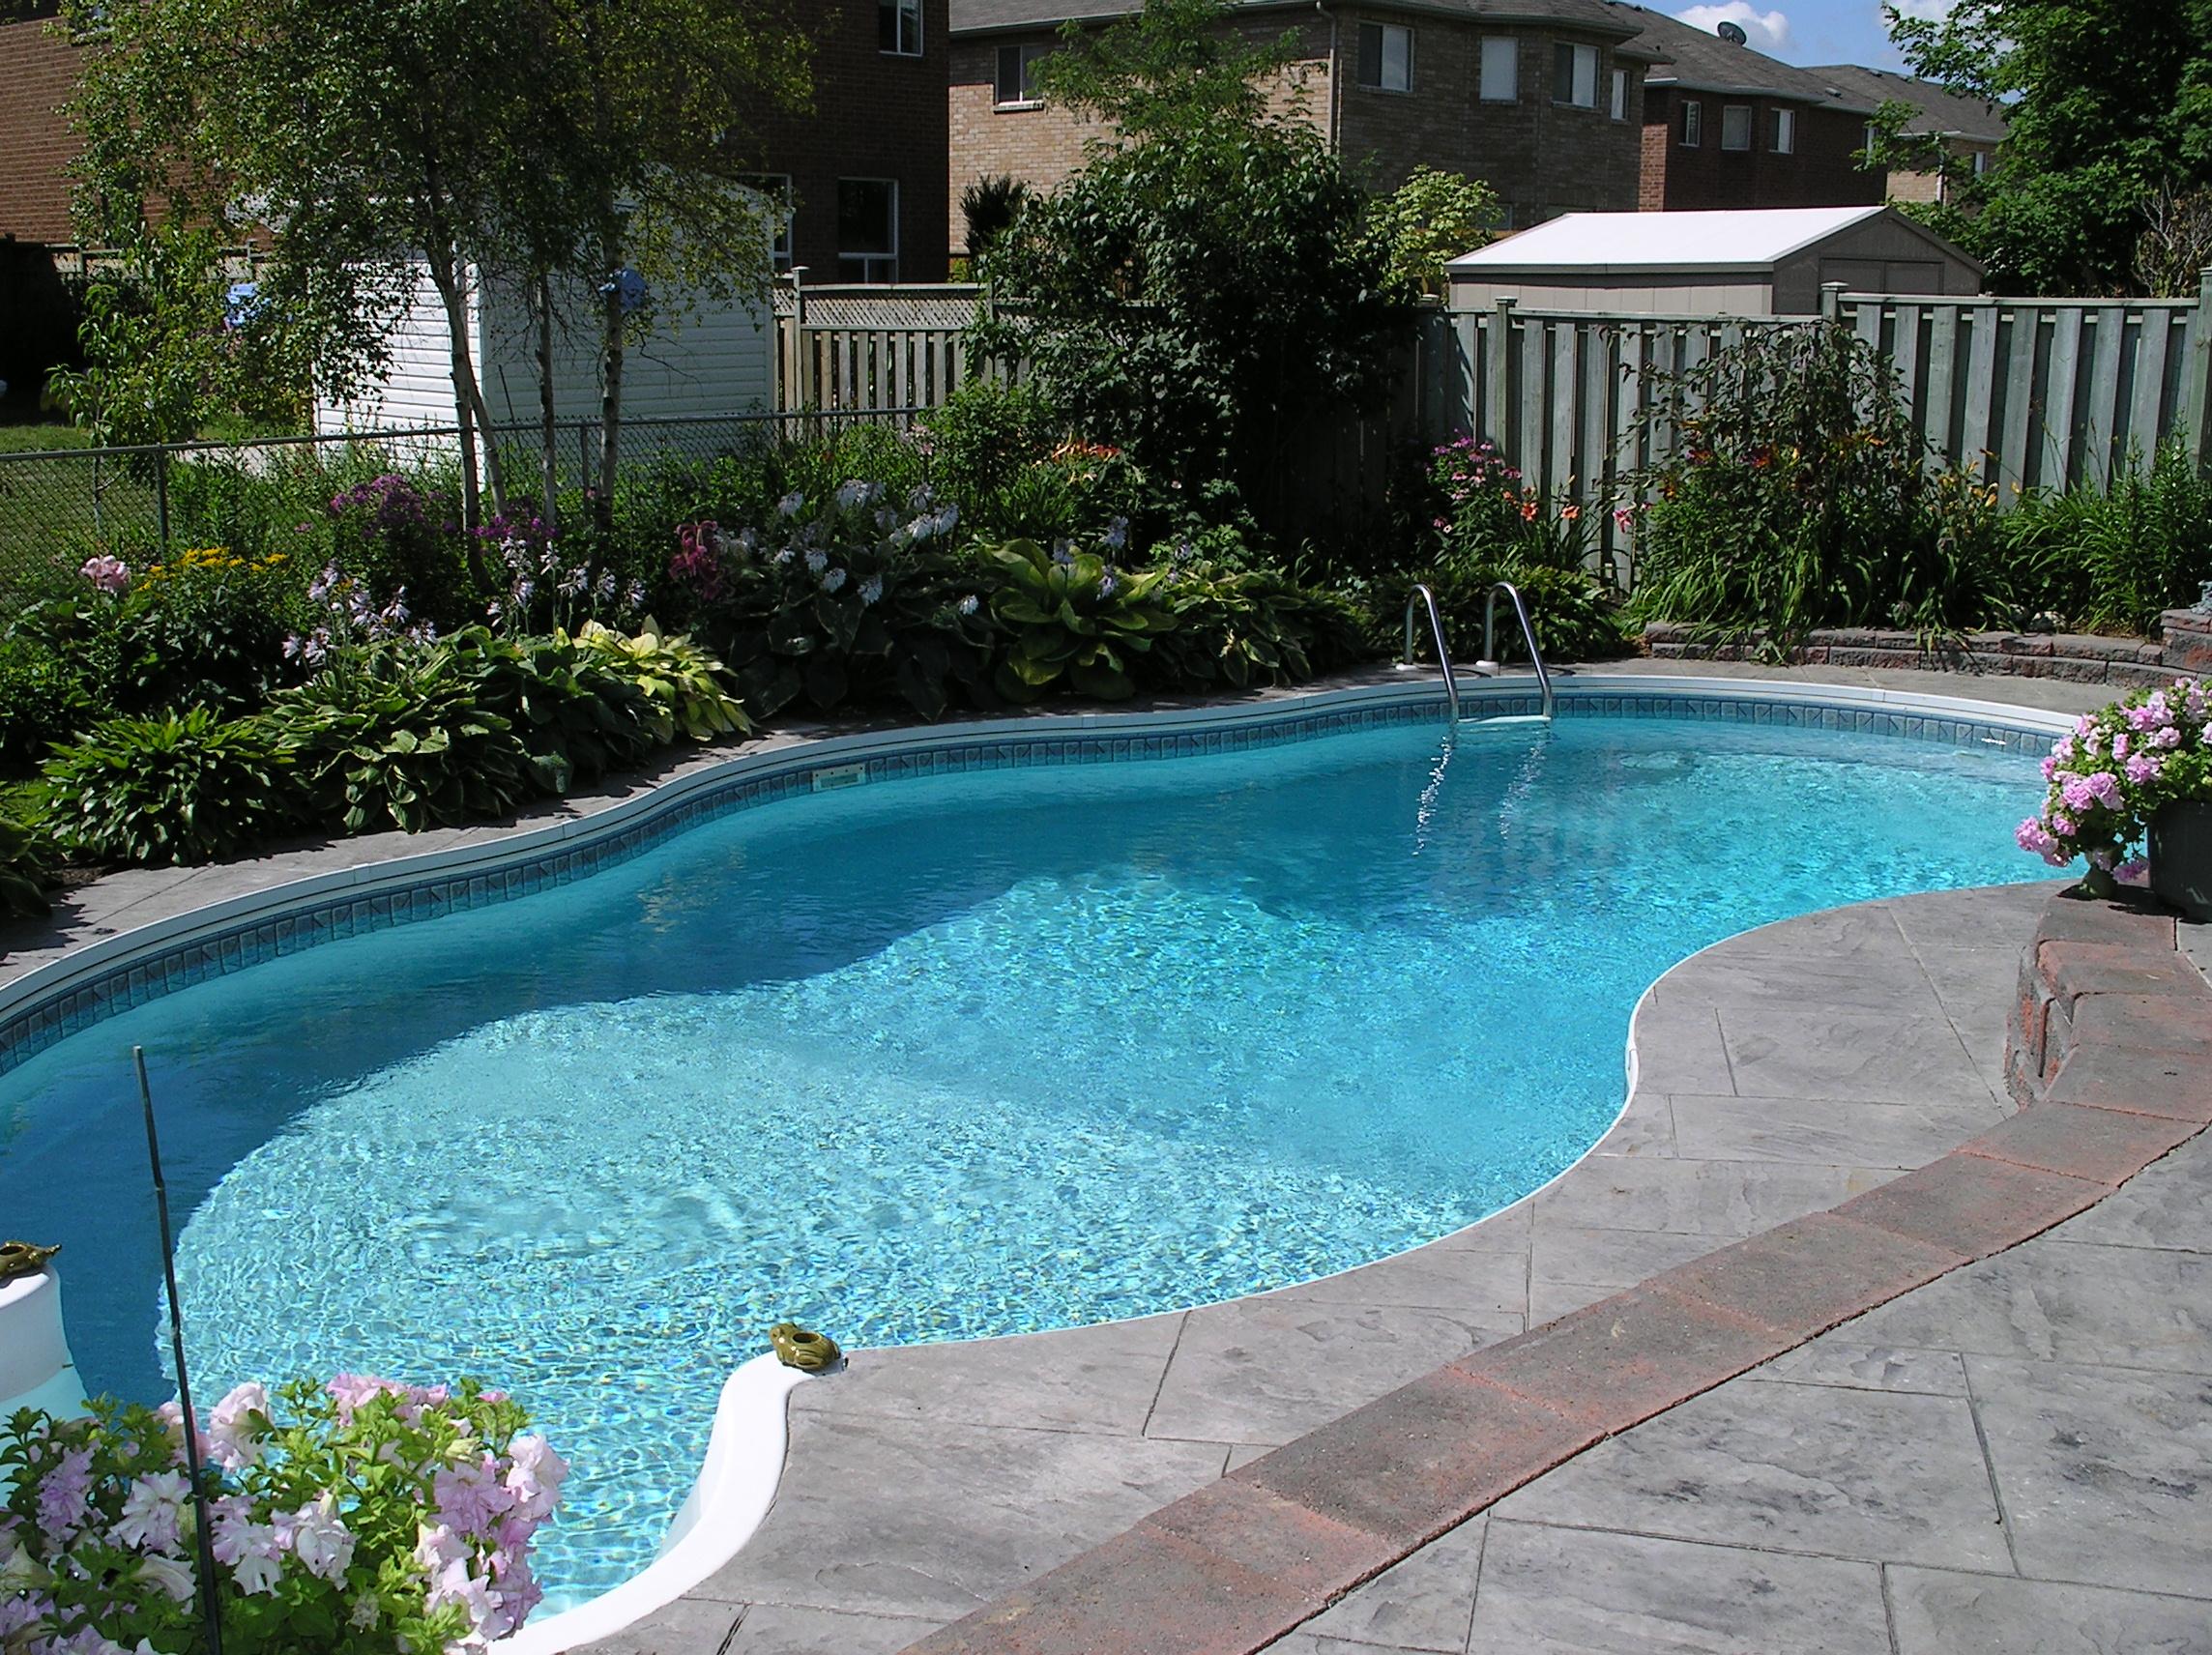 Swimming pool  Wikidwelling  FANDOM powered by Wikia